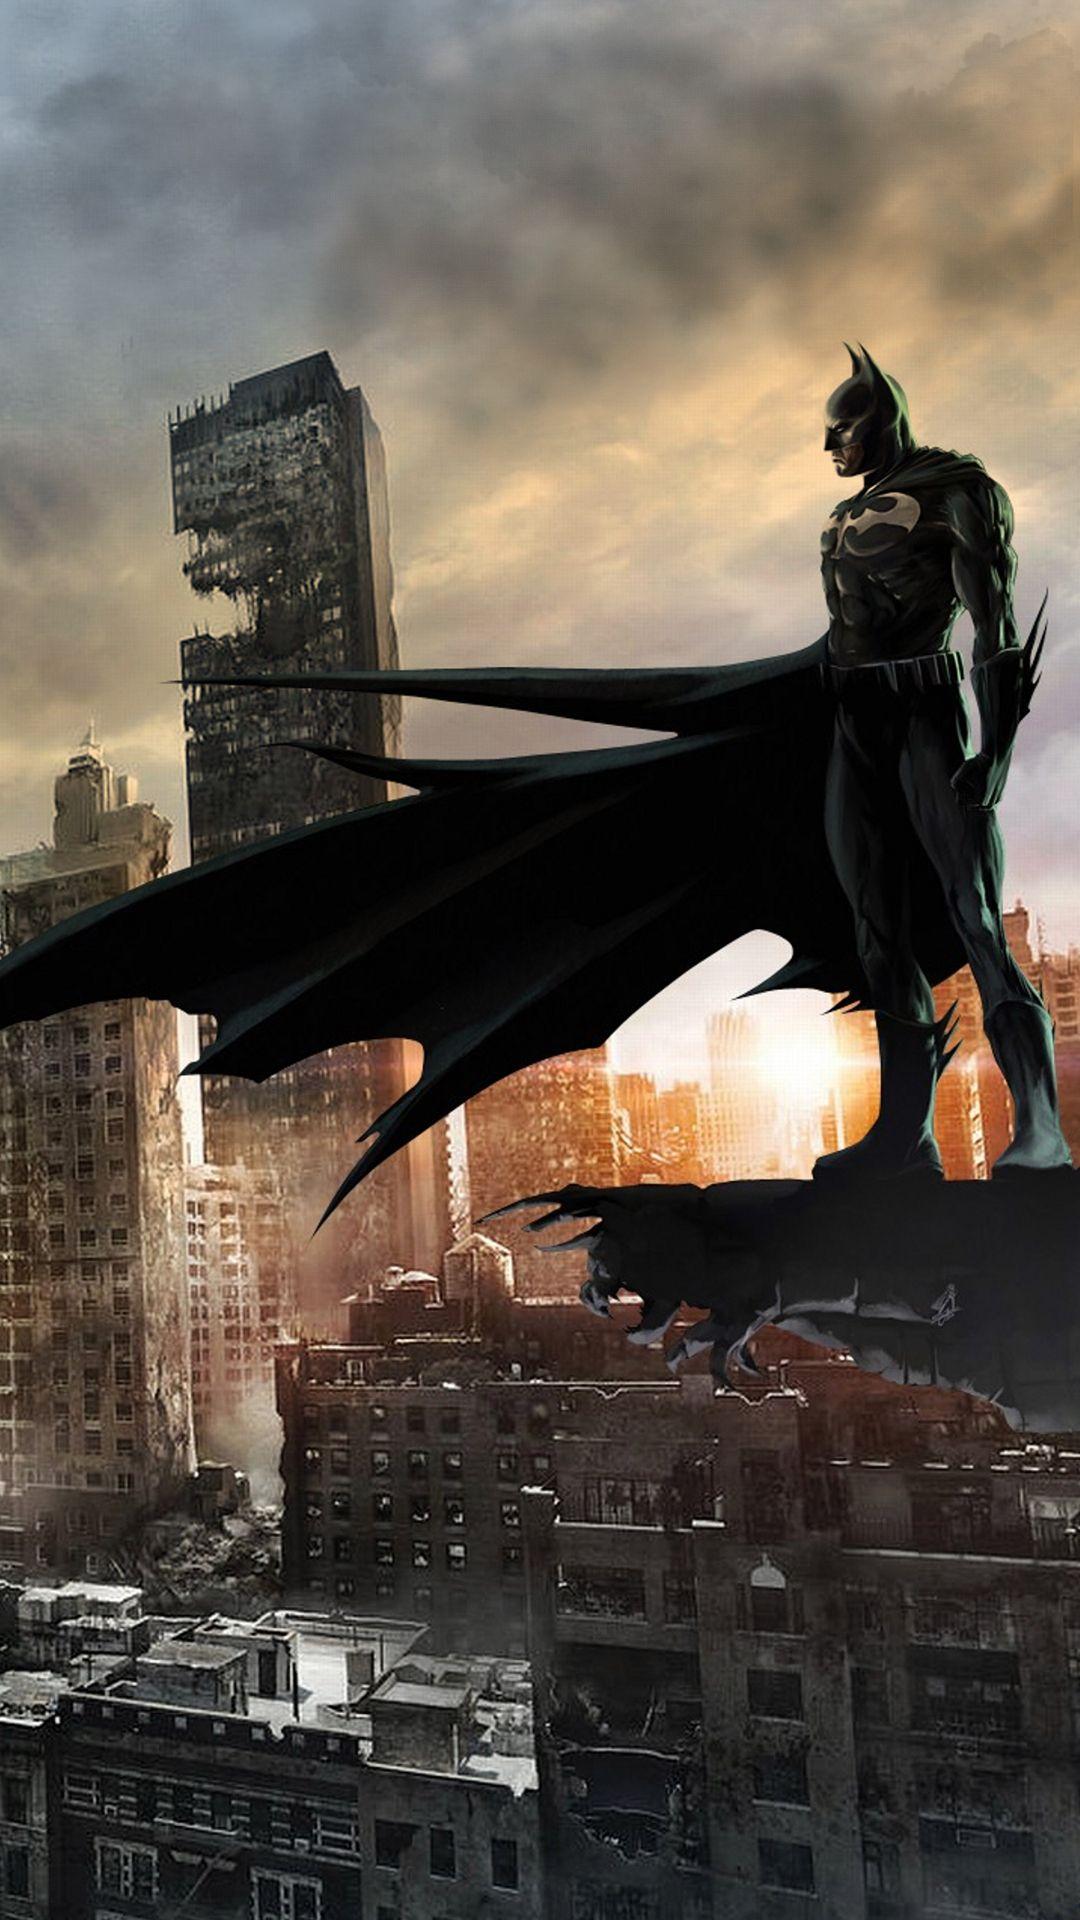 Batman City Mobile Hd Wallpaper Batman Wallpaper Iphone Batman Wallpaper Batman City 1080p batman phone wallpaper